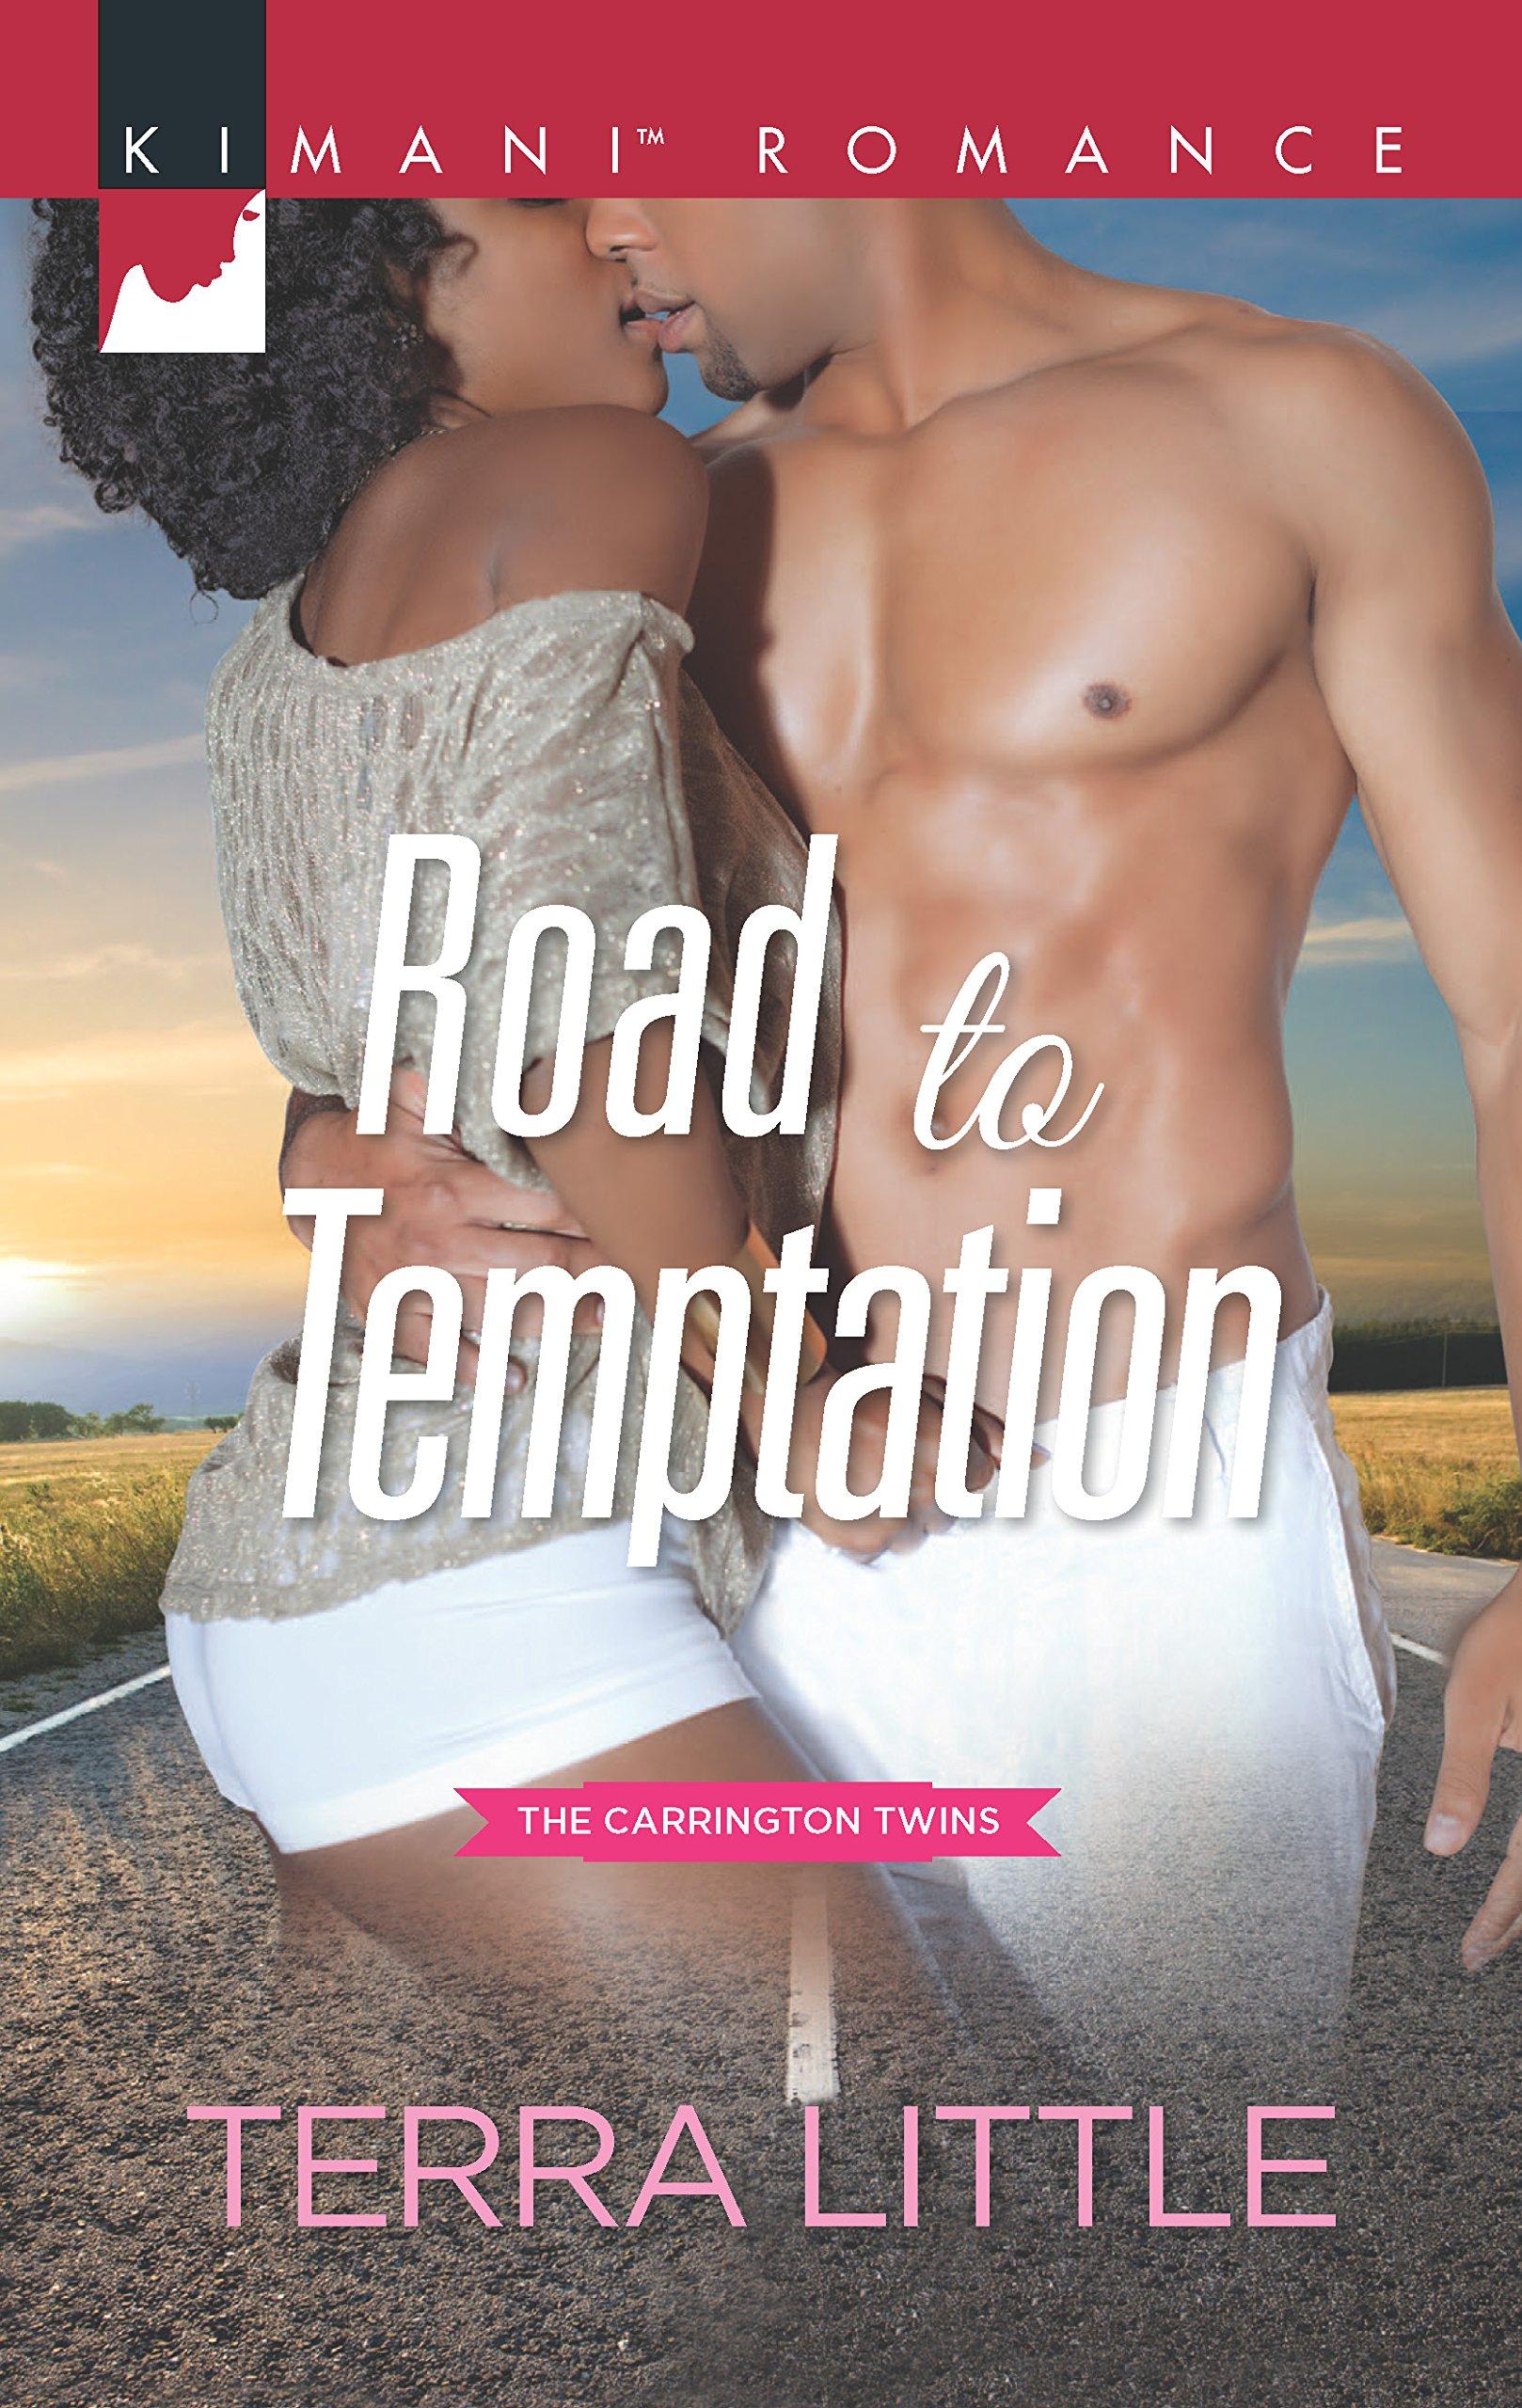 Amazon.com: Road to Temptation (The Carrington Twins) (9780373864843):  Terra Little: Books